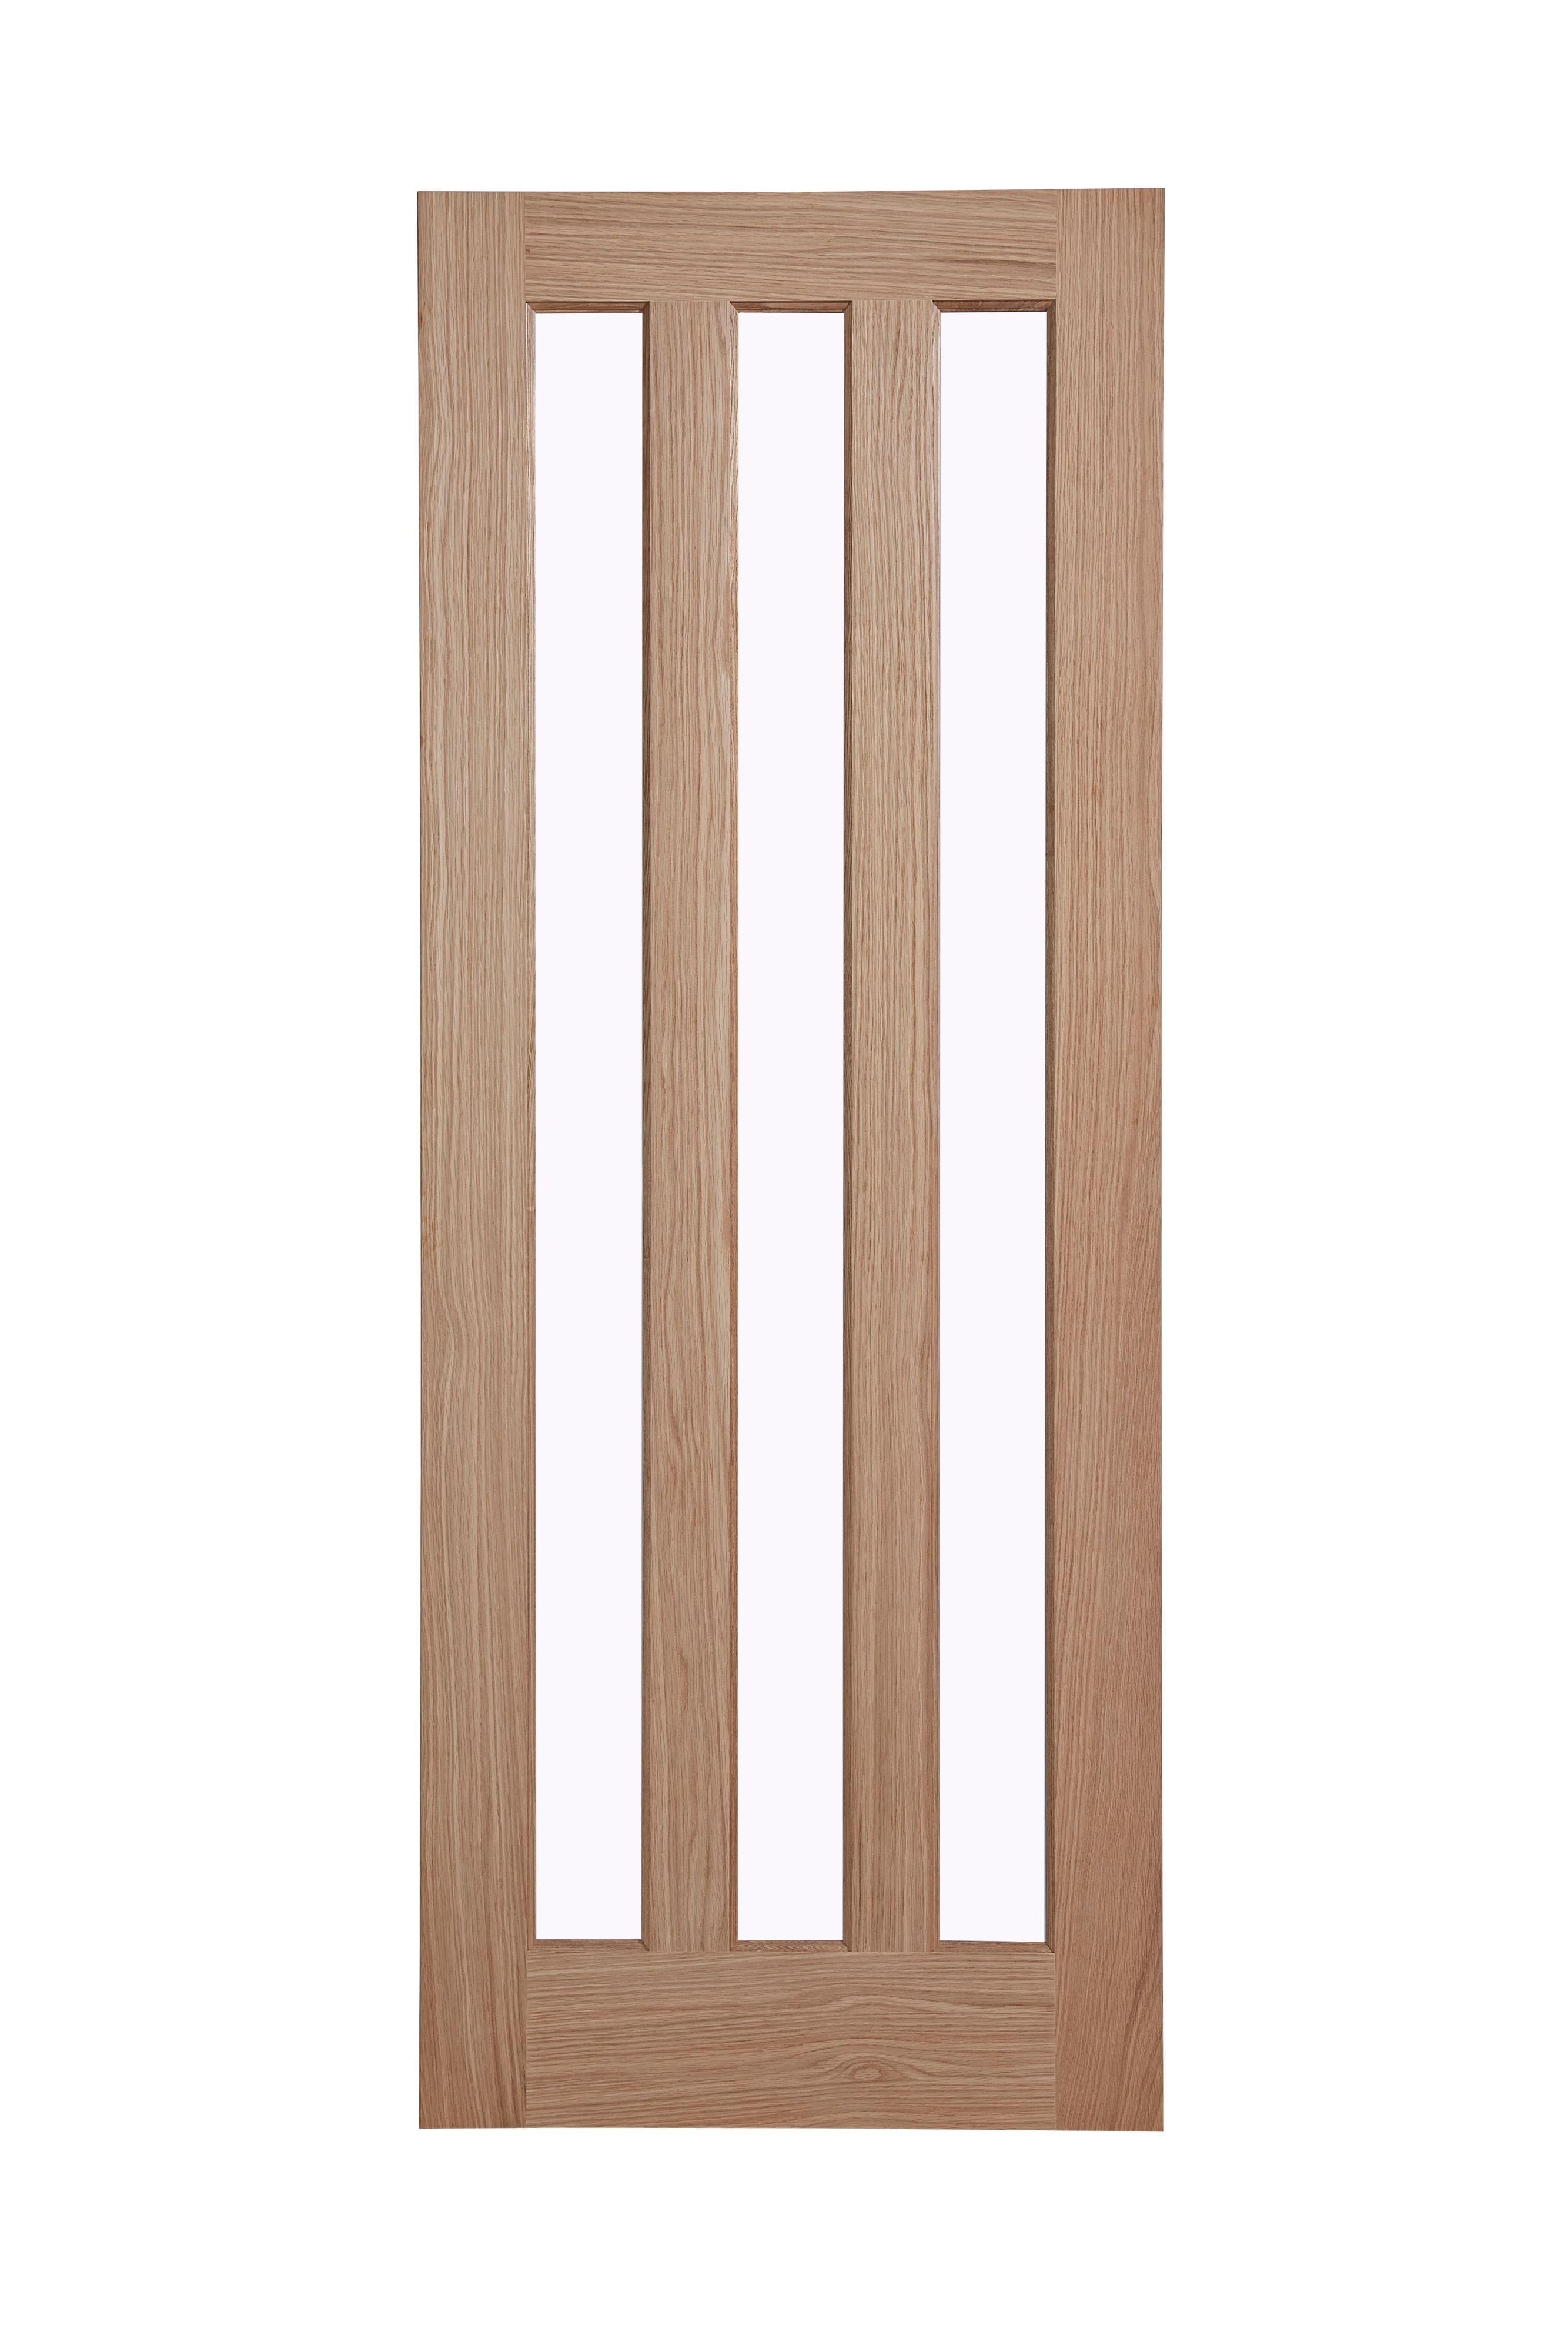 Vertical 3 Panel Oak Veneer Internal Standard Door H 1981mm W 762mm Departments Diy At B Q